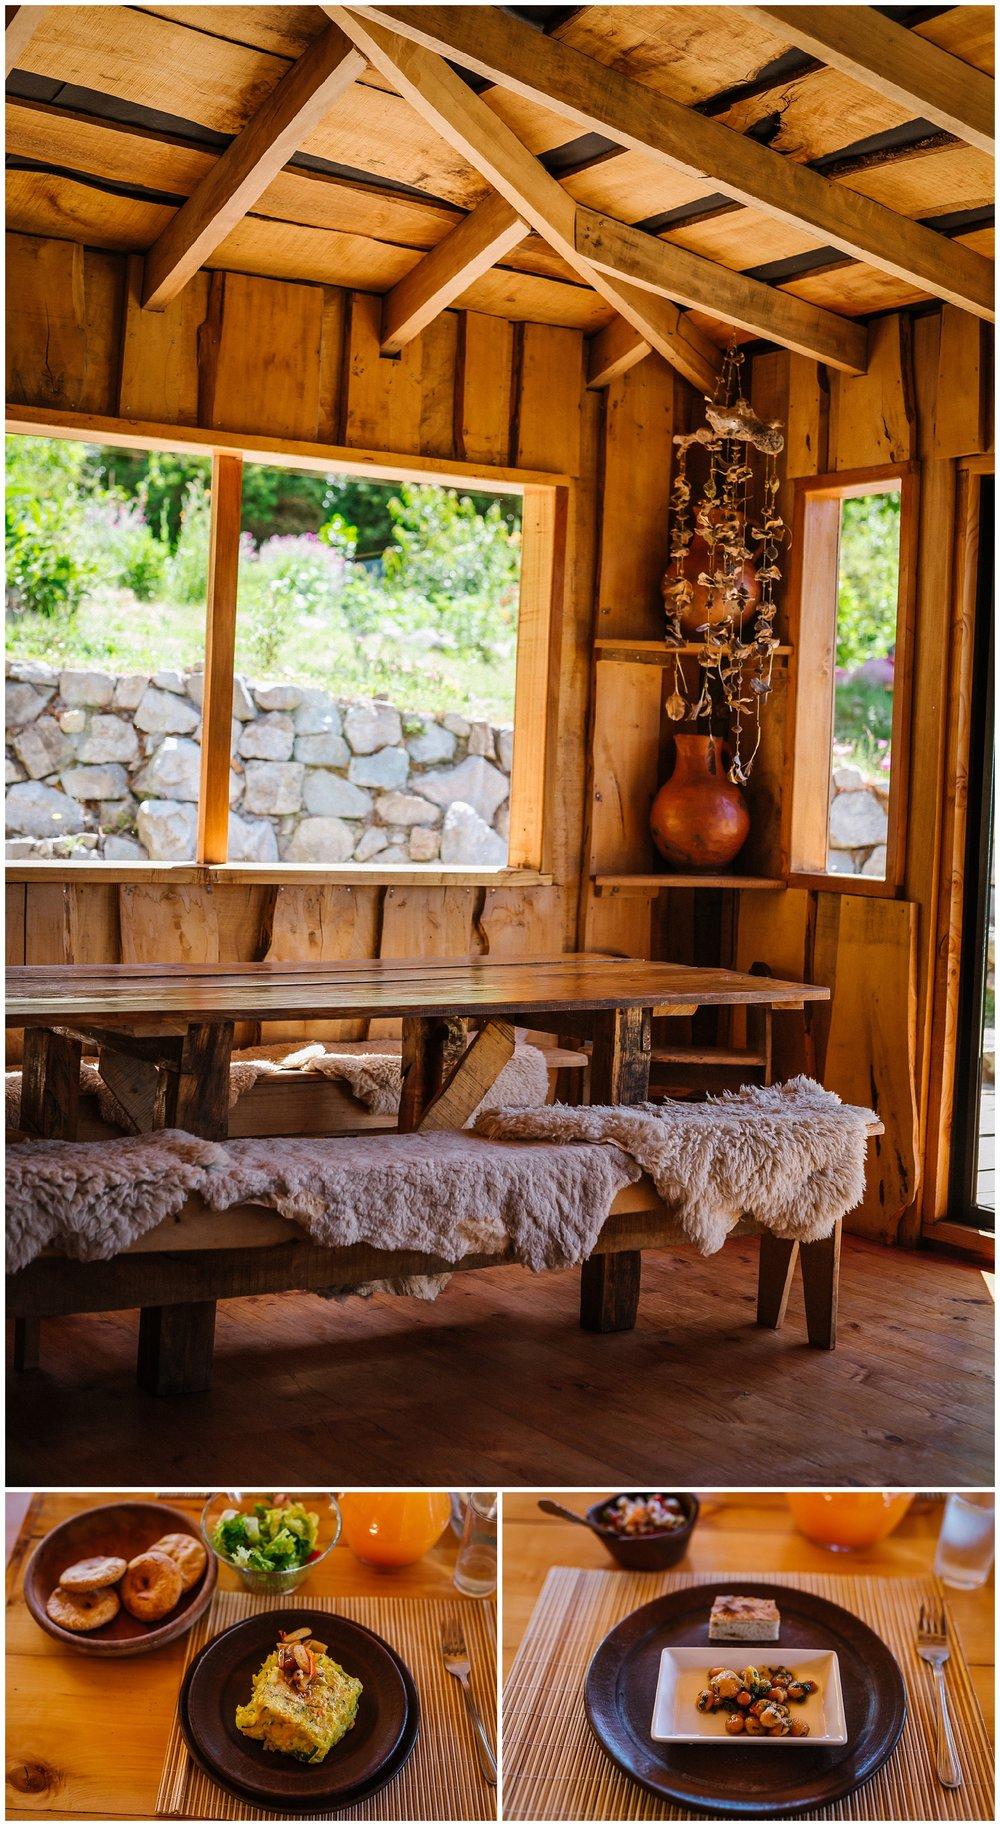 Cheilean-destination-adventure-wedding-florida-patagonia-pucon-santa-cruz-vsco_0028.jpg